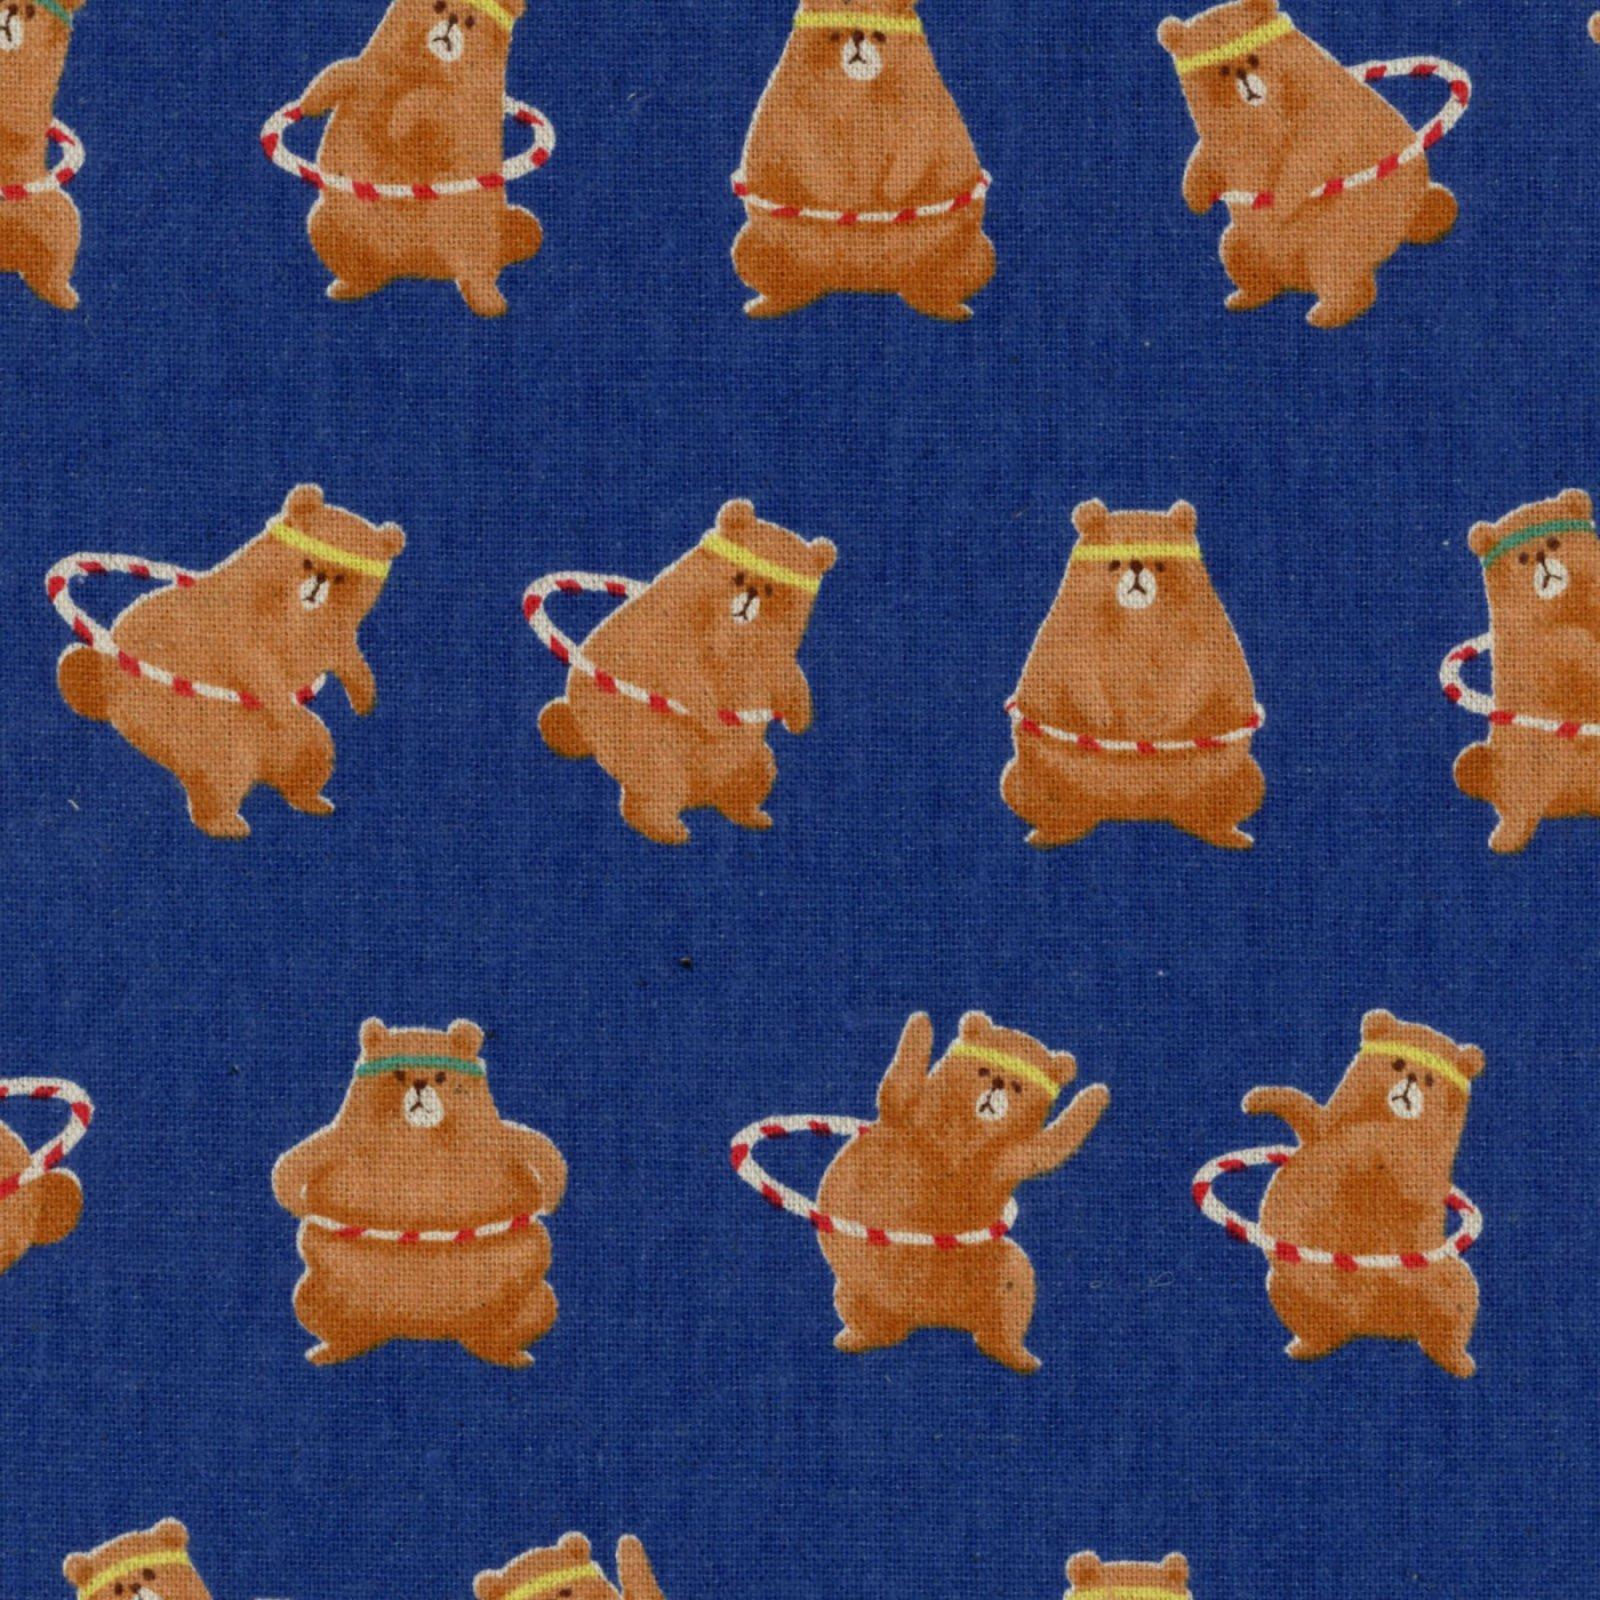 Cosmo - Cotton/Linen Canvas - Workout Bear - Blue